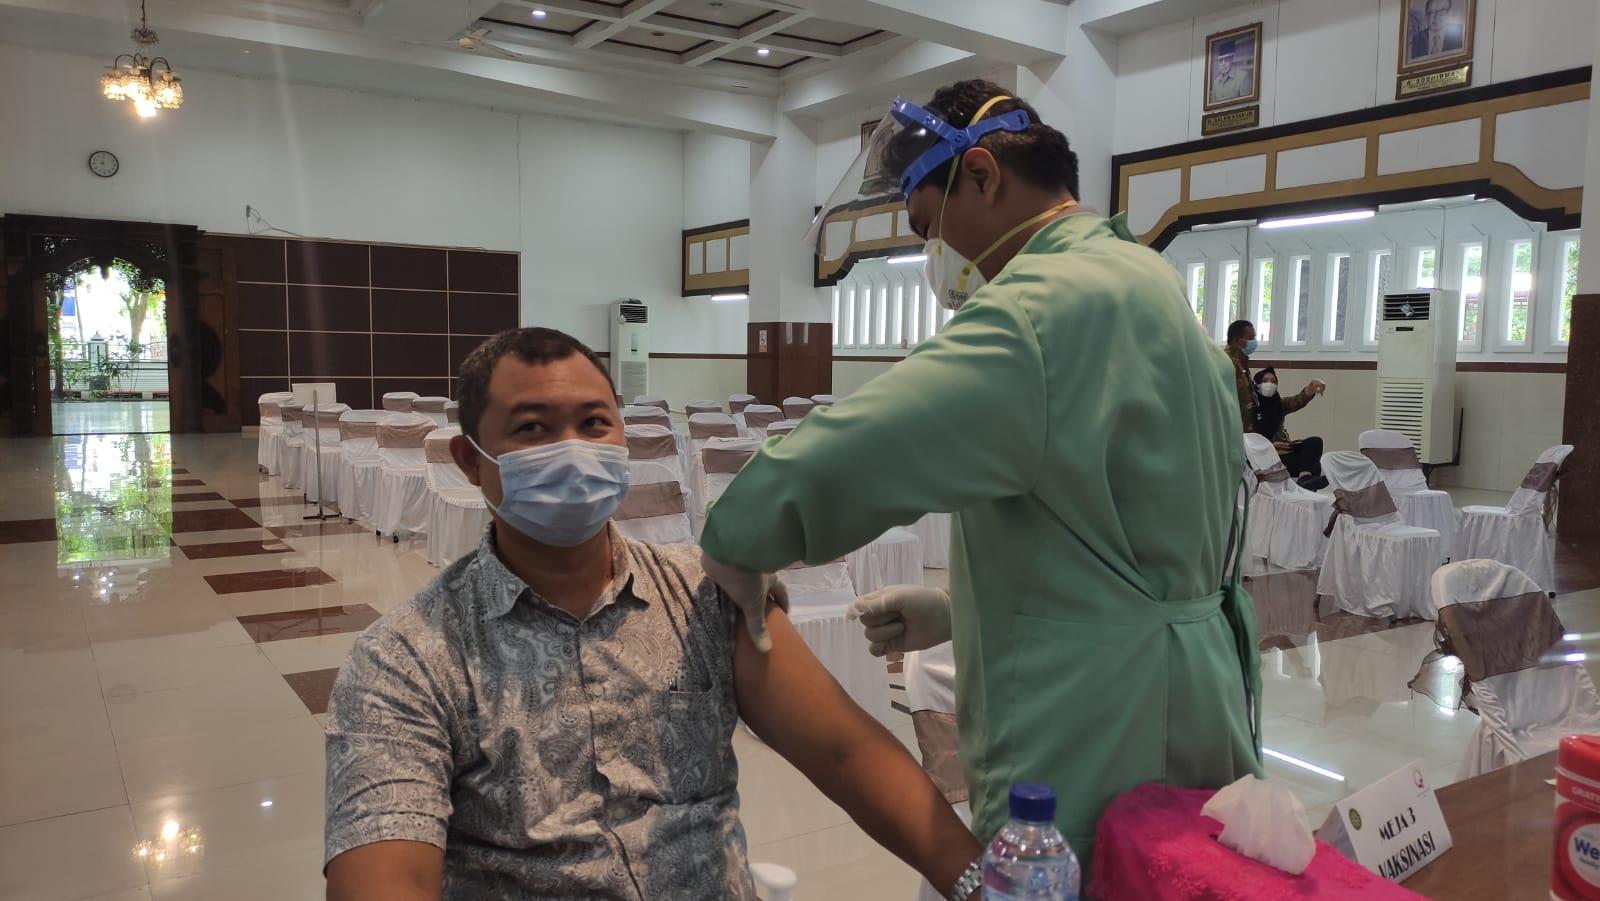 VAKSINASI: Ilustrasi warga sedang melakukan vaksinasi Covid-19 belum lama ini.